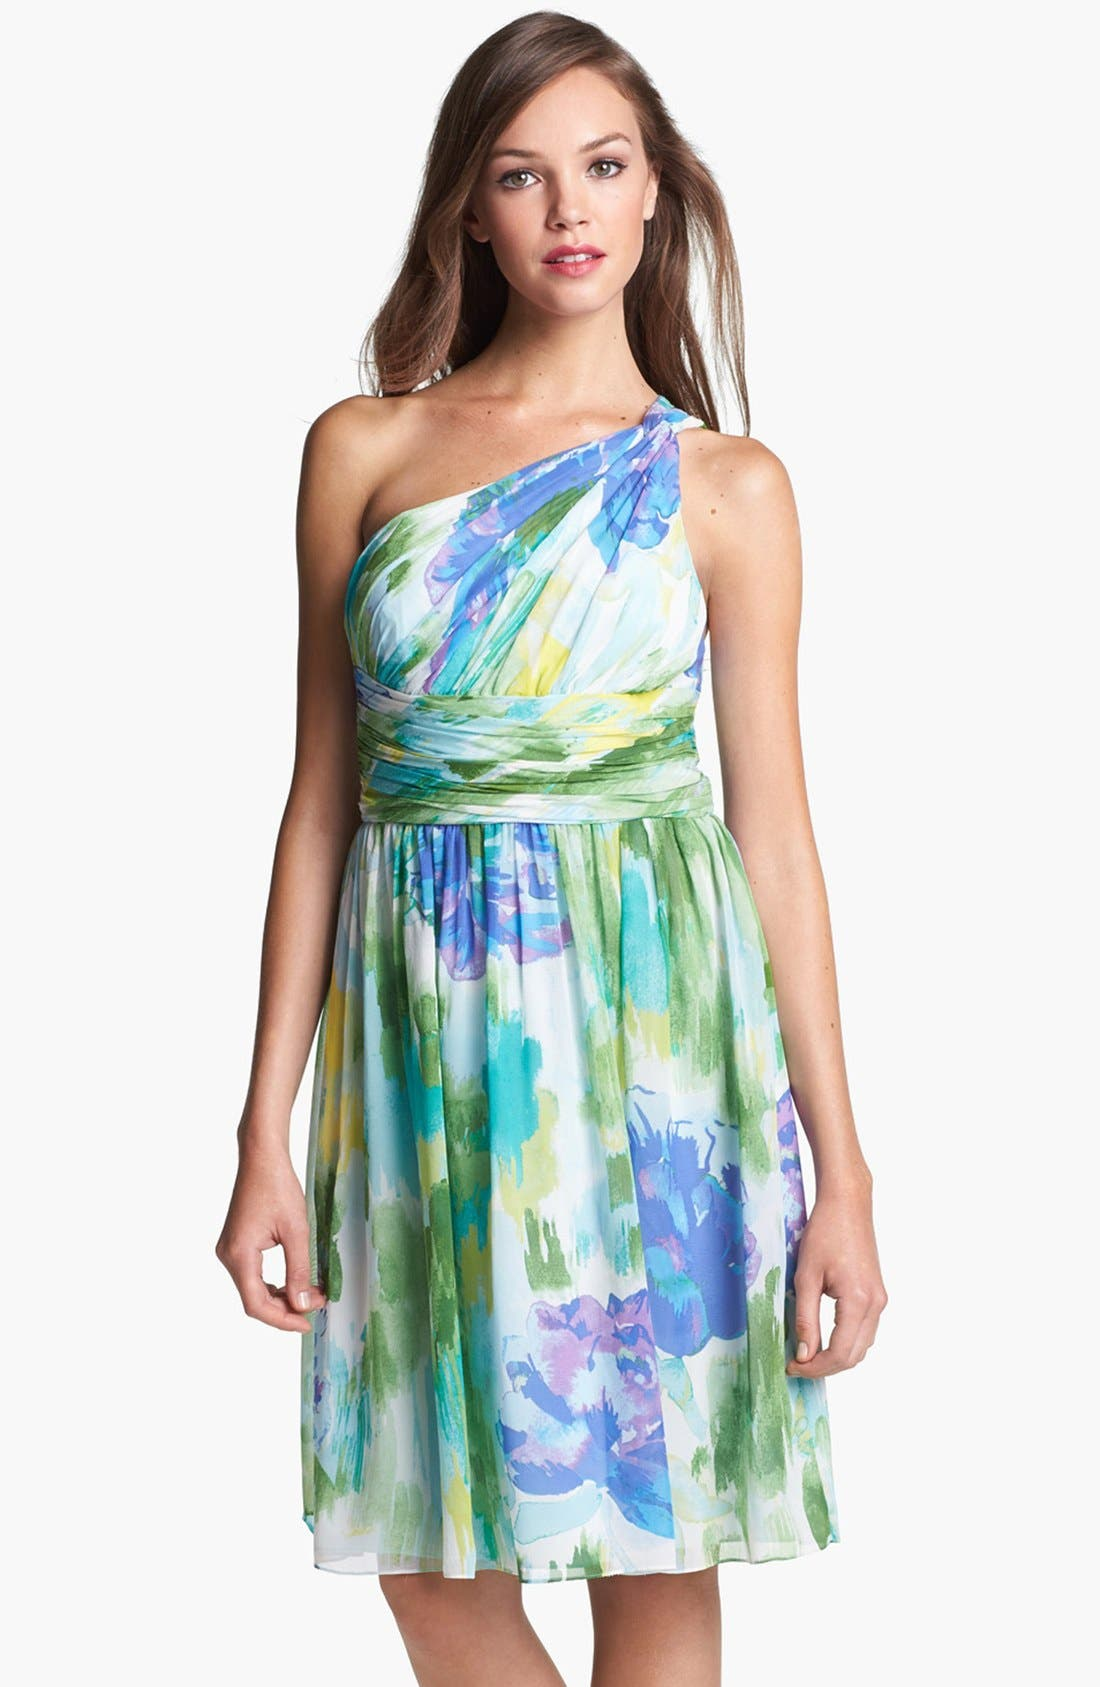 Alternate Image 1 Selected - Donna Morgan 'Rhea' One-Shoulder Print Dress (Online Only)